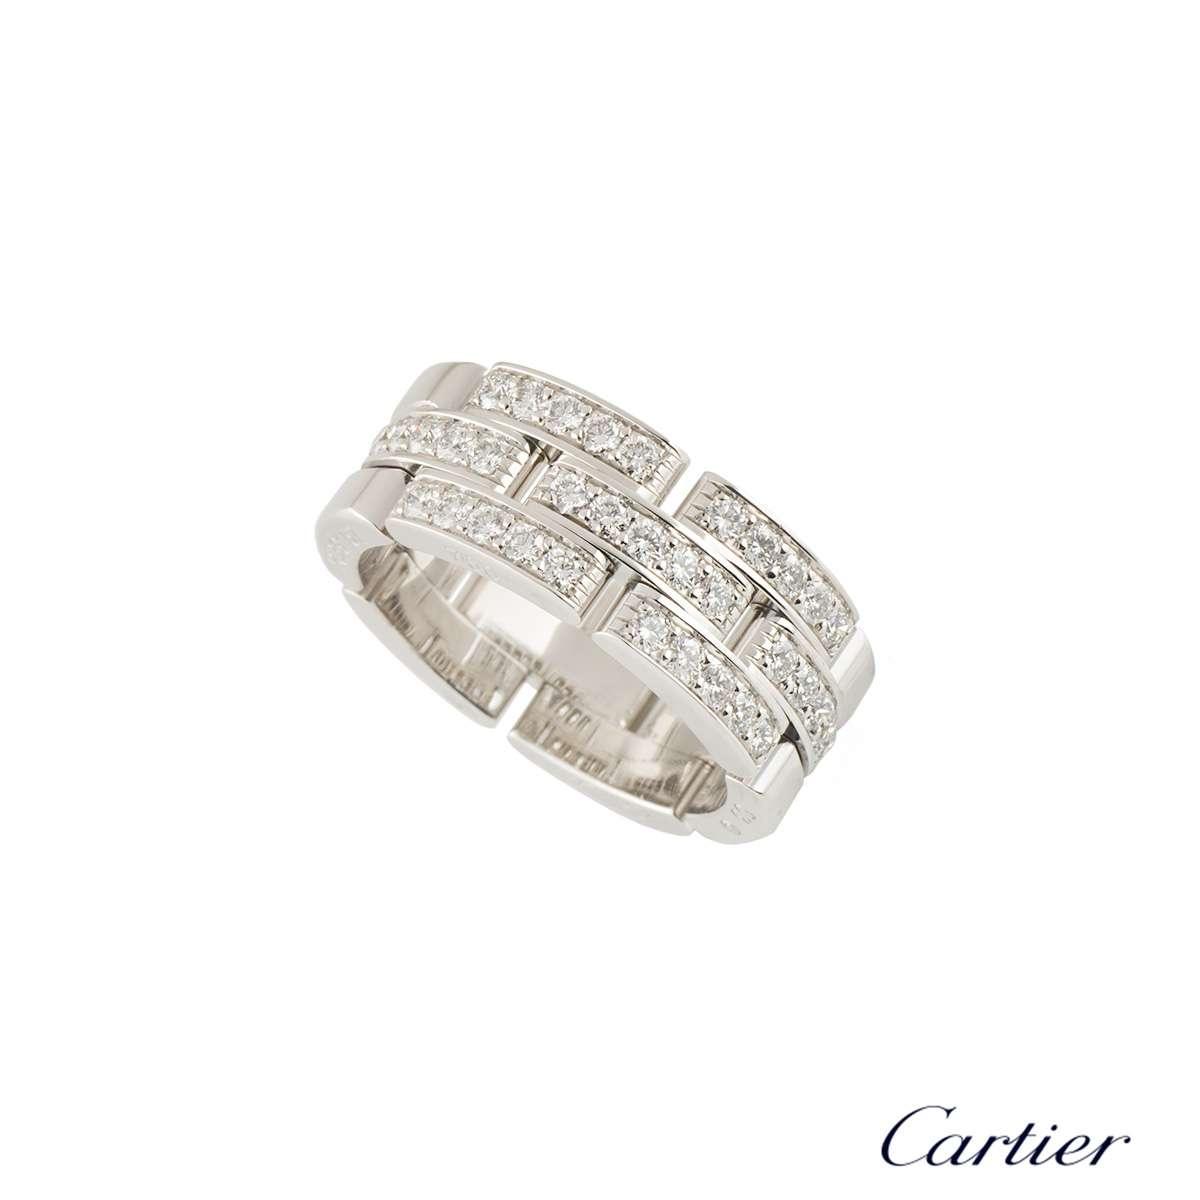 CartierWhite Gold Diamond Set Maillon Panthere RingB4127200